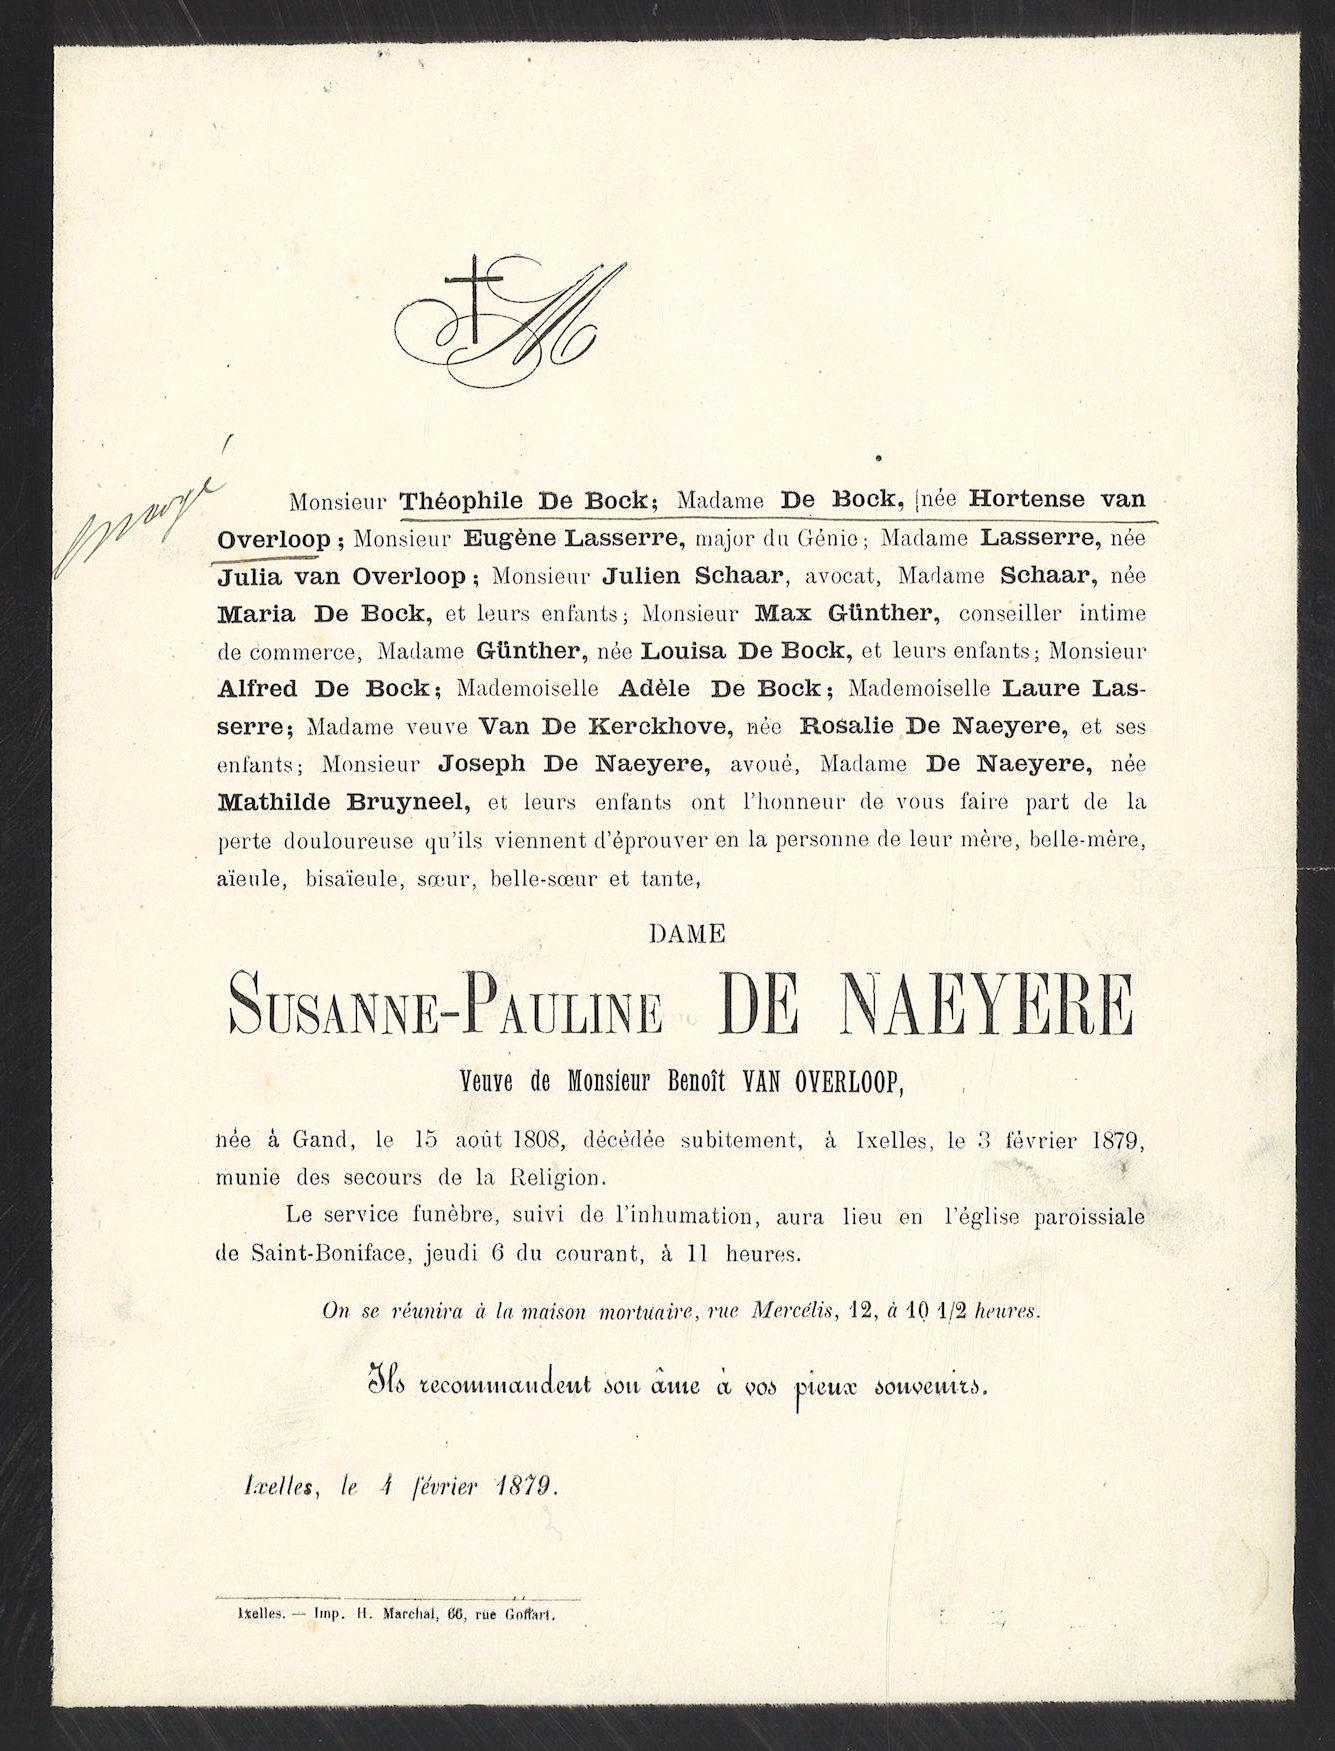 Susanne-Pauline De Naeyere